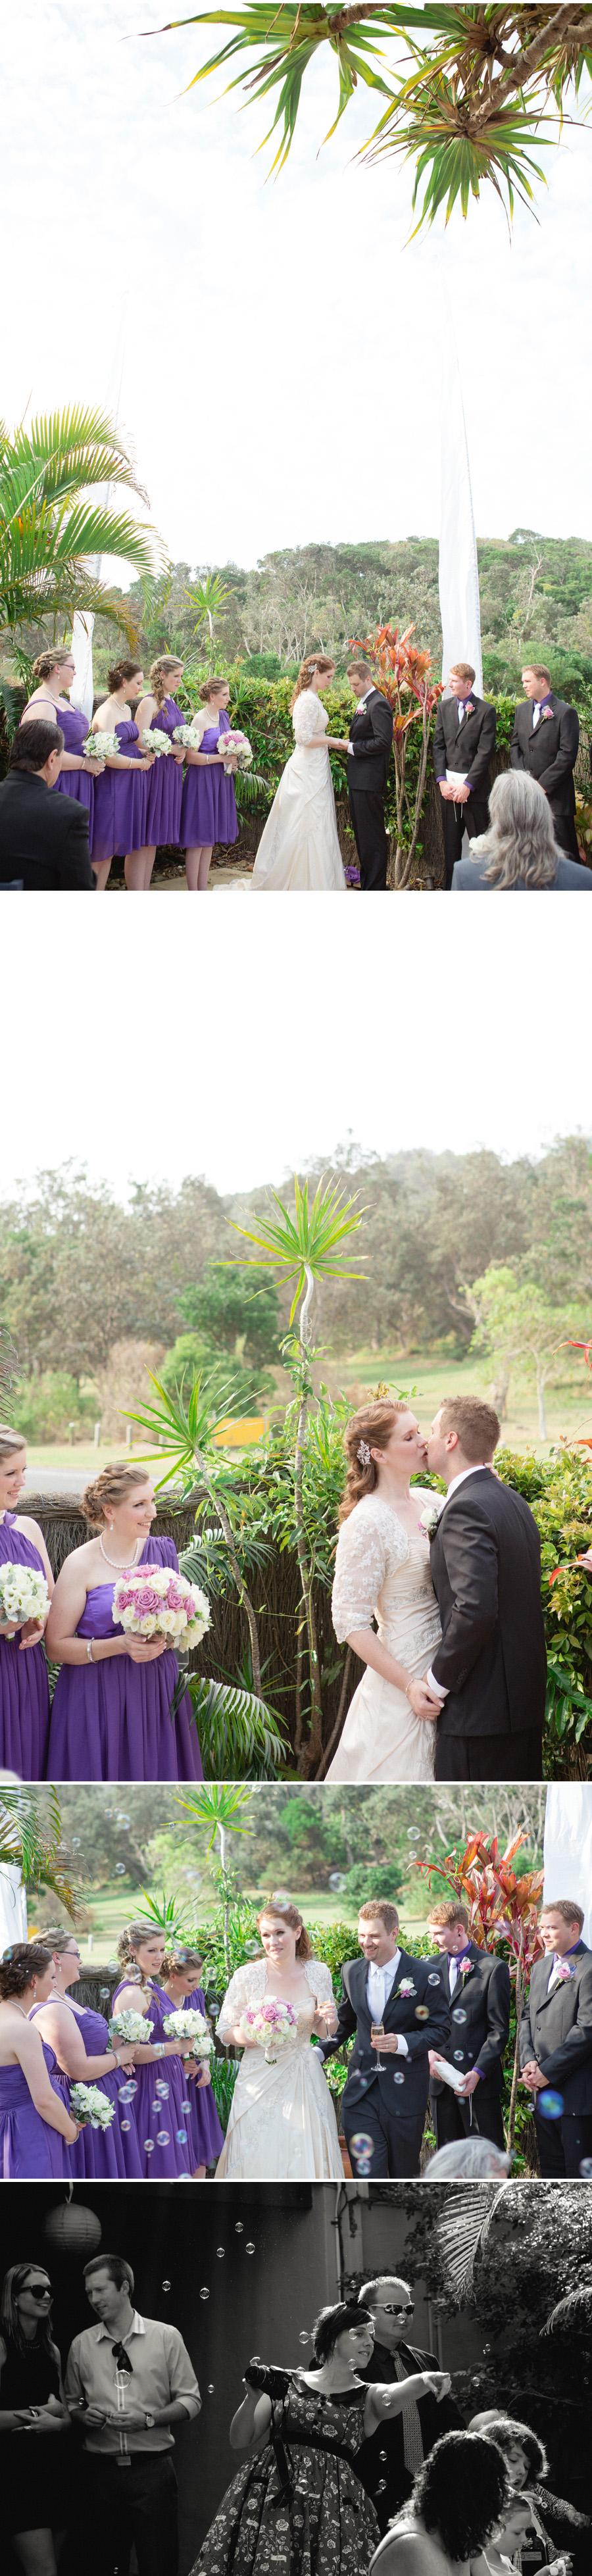 Brisbane Wedding Photography_039.jpg